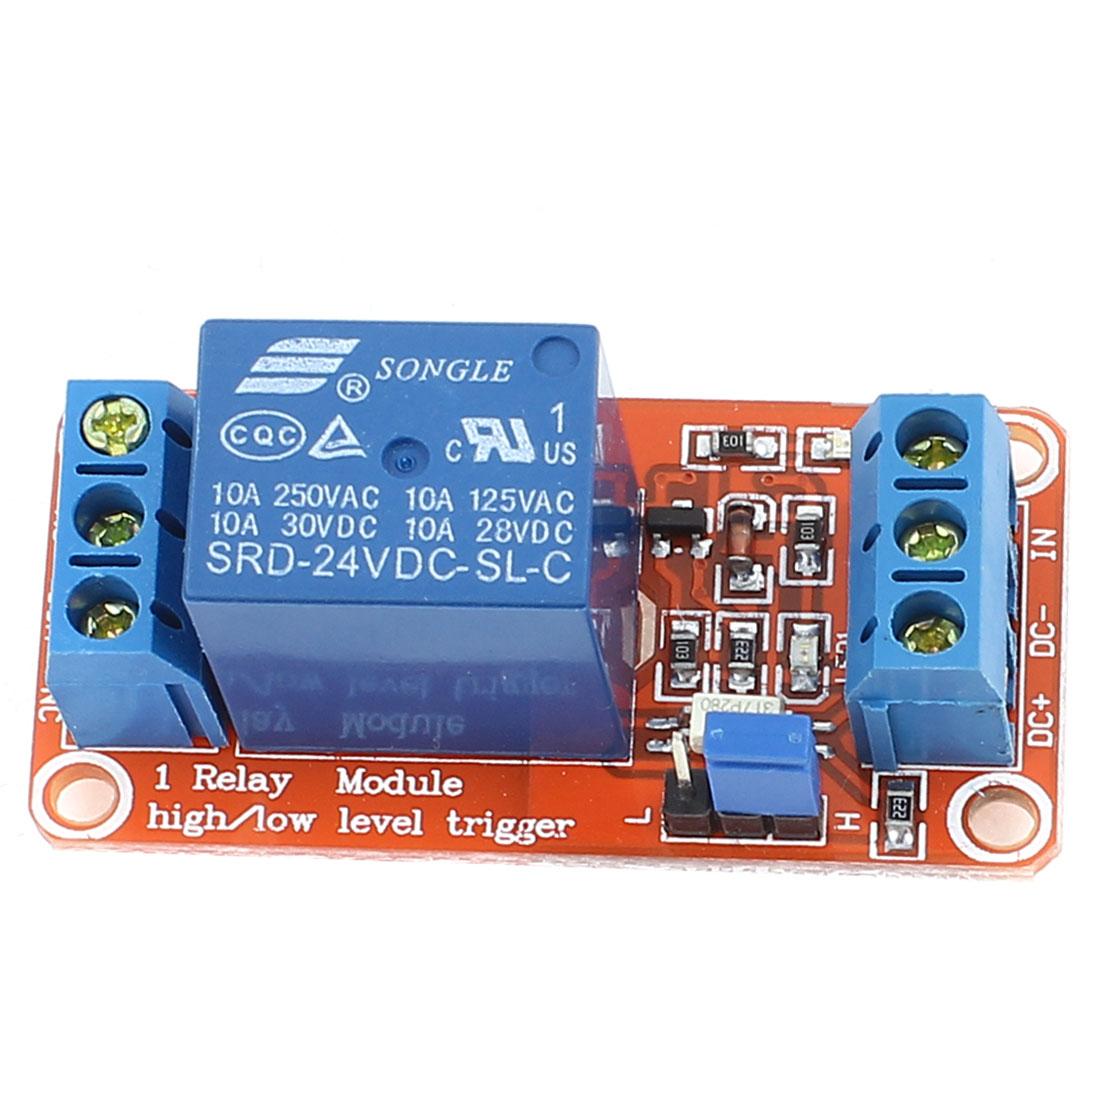 SRD-24VDC-SL-C 1 Channel High/Low Level Trigger Optical Coupler Relay Module DC24V 10A